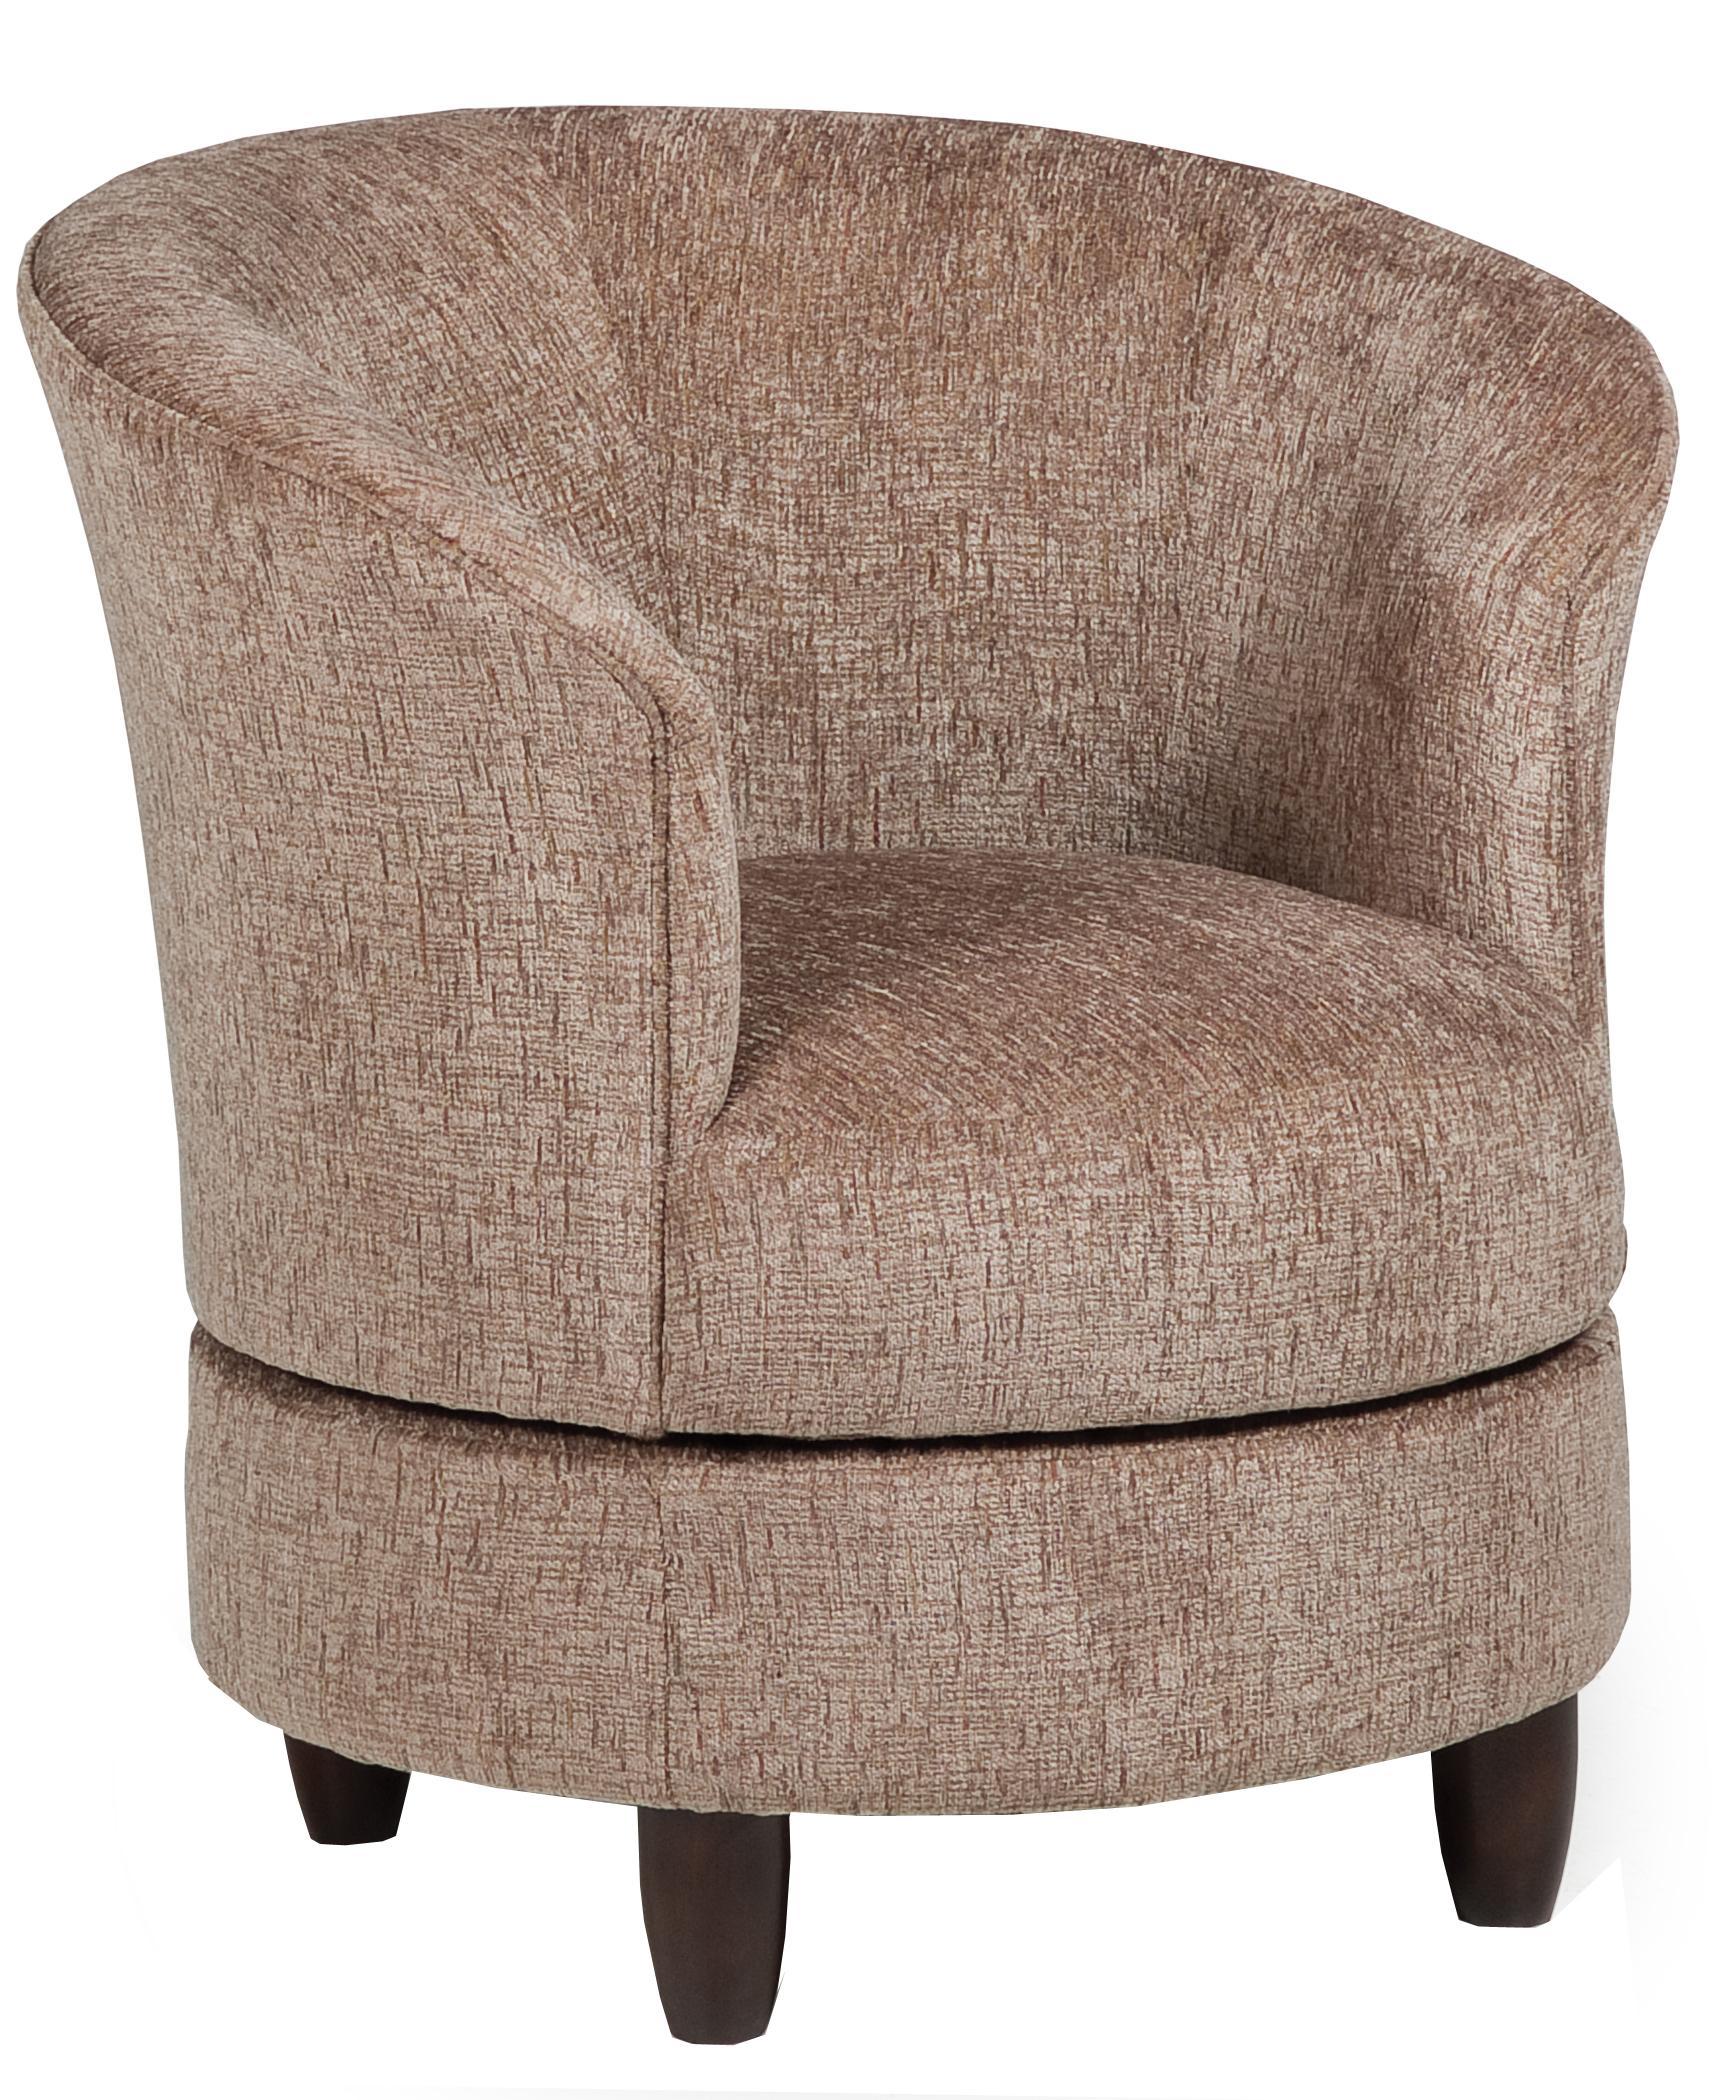 Genial Best Home Furnishings Dysis Swivel Barrel Chair | Rotmans ...